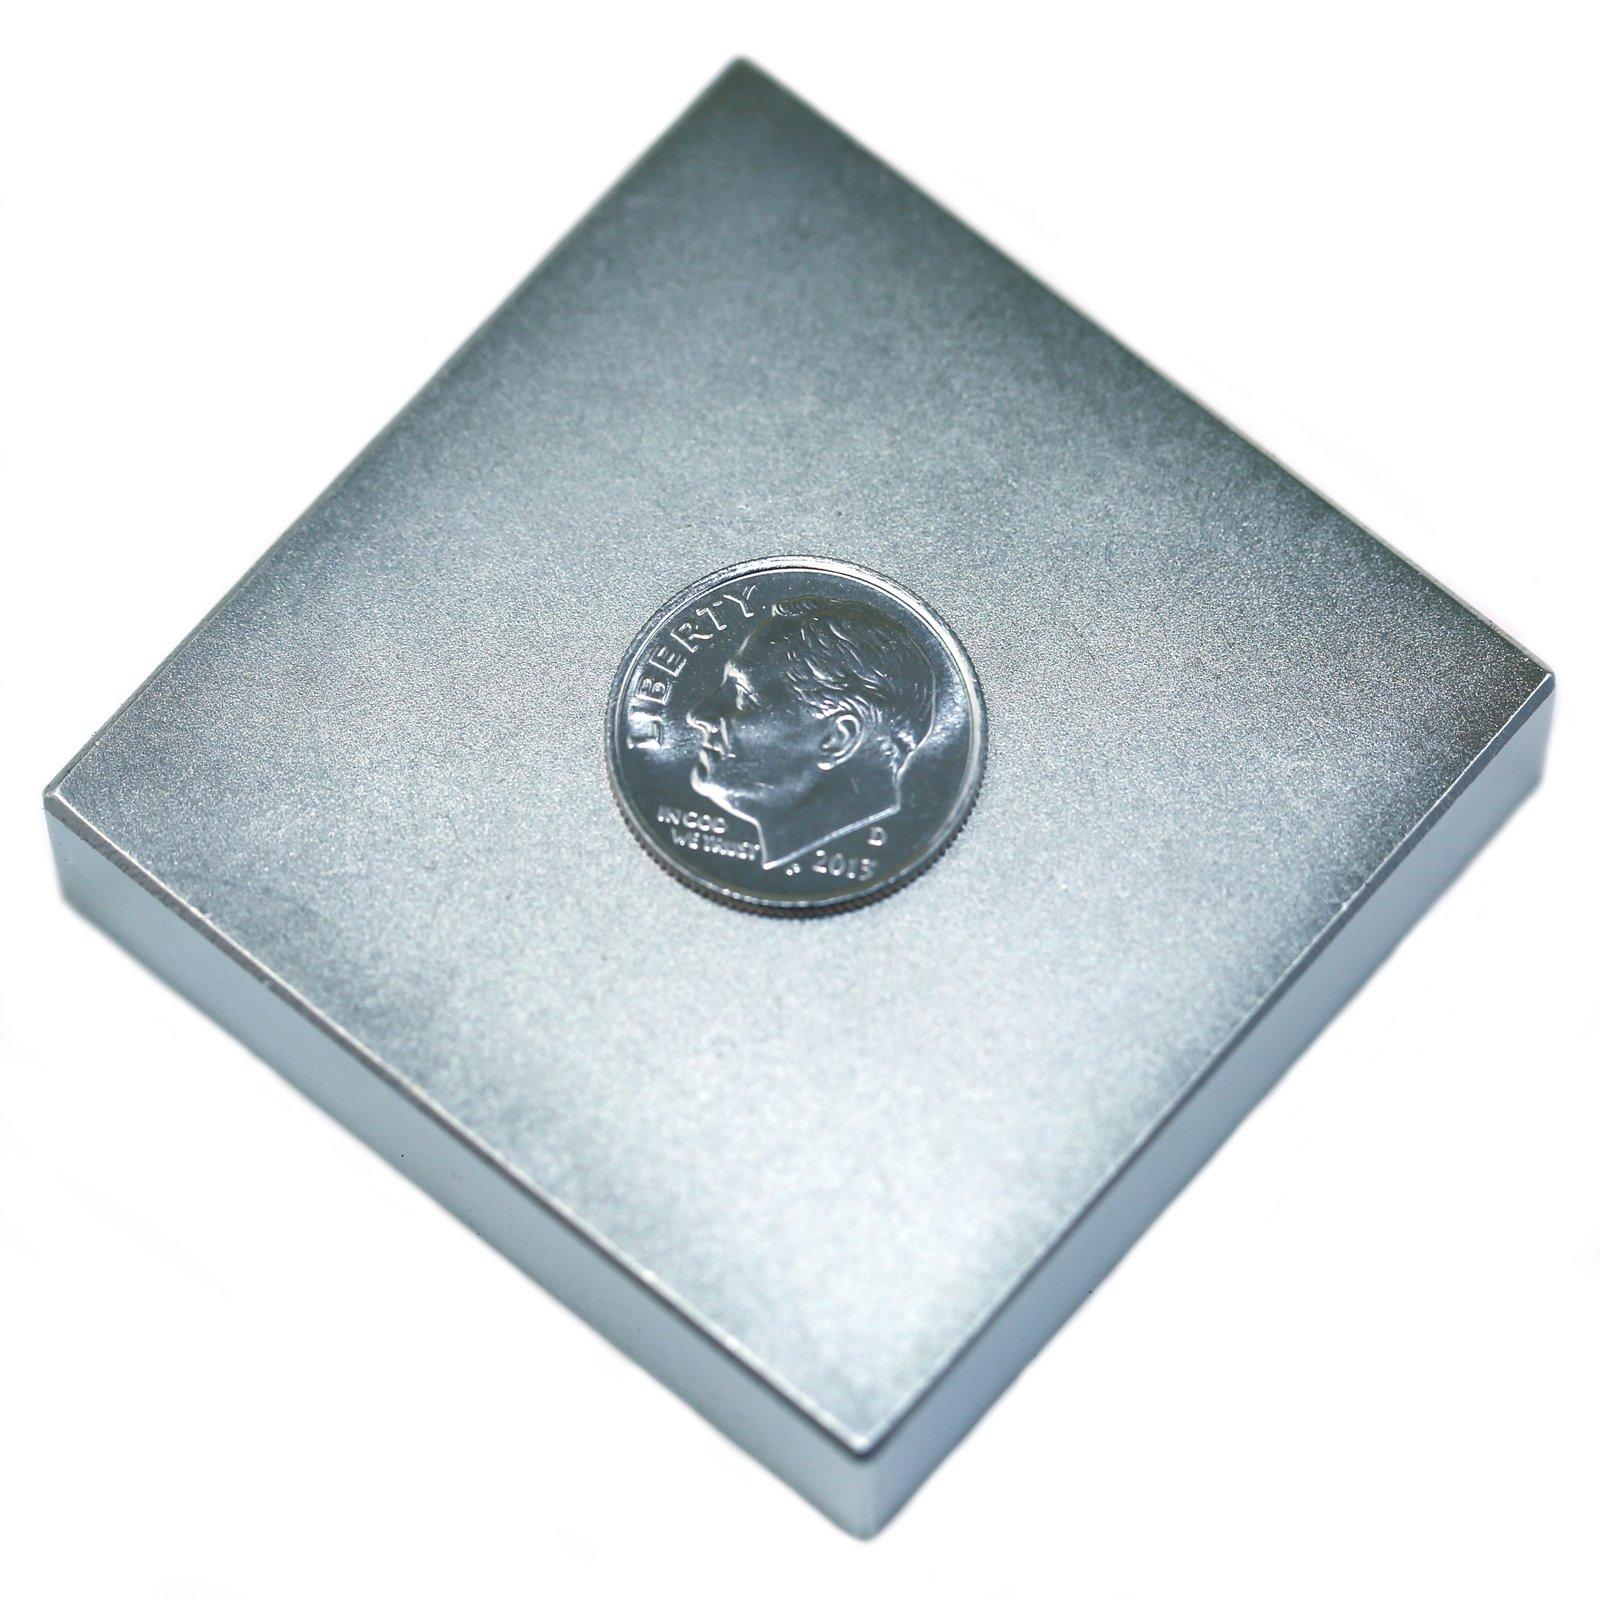 Applied Magnets 2'' x 2'' x 1/2'' N42 Neodymium Block Magnet